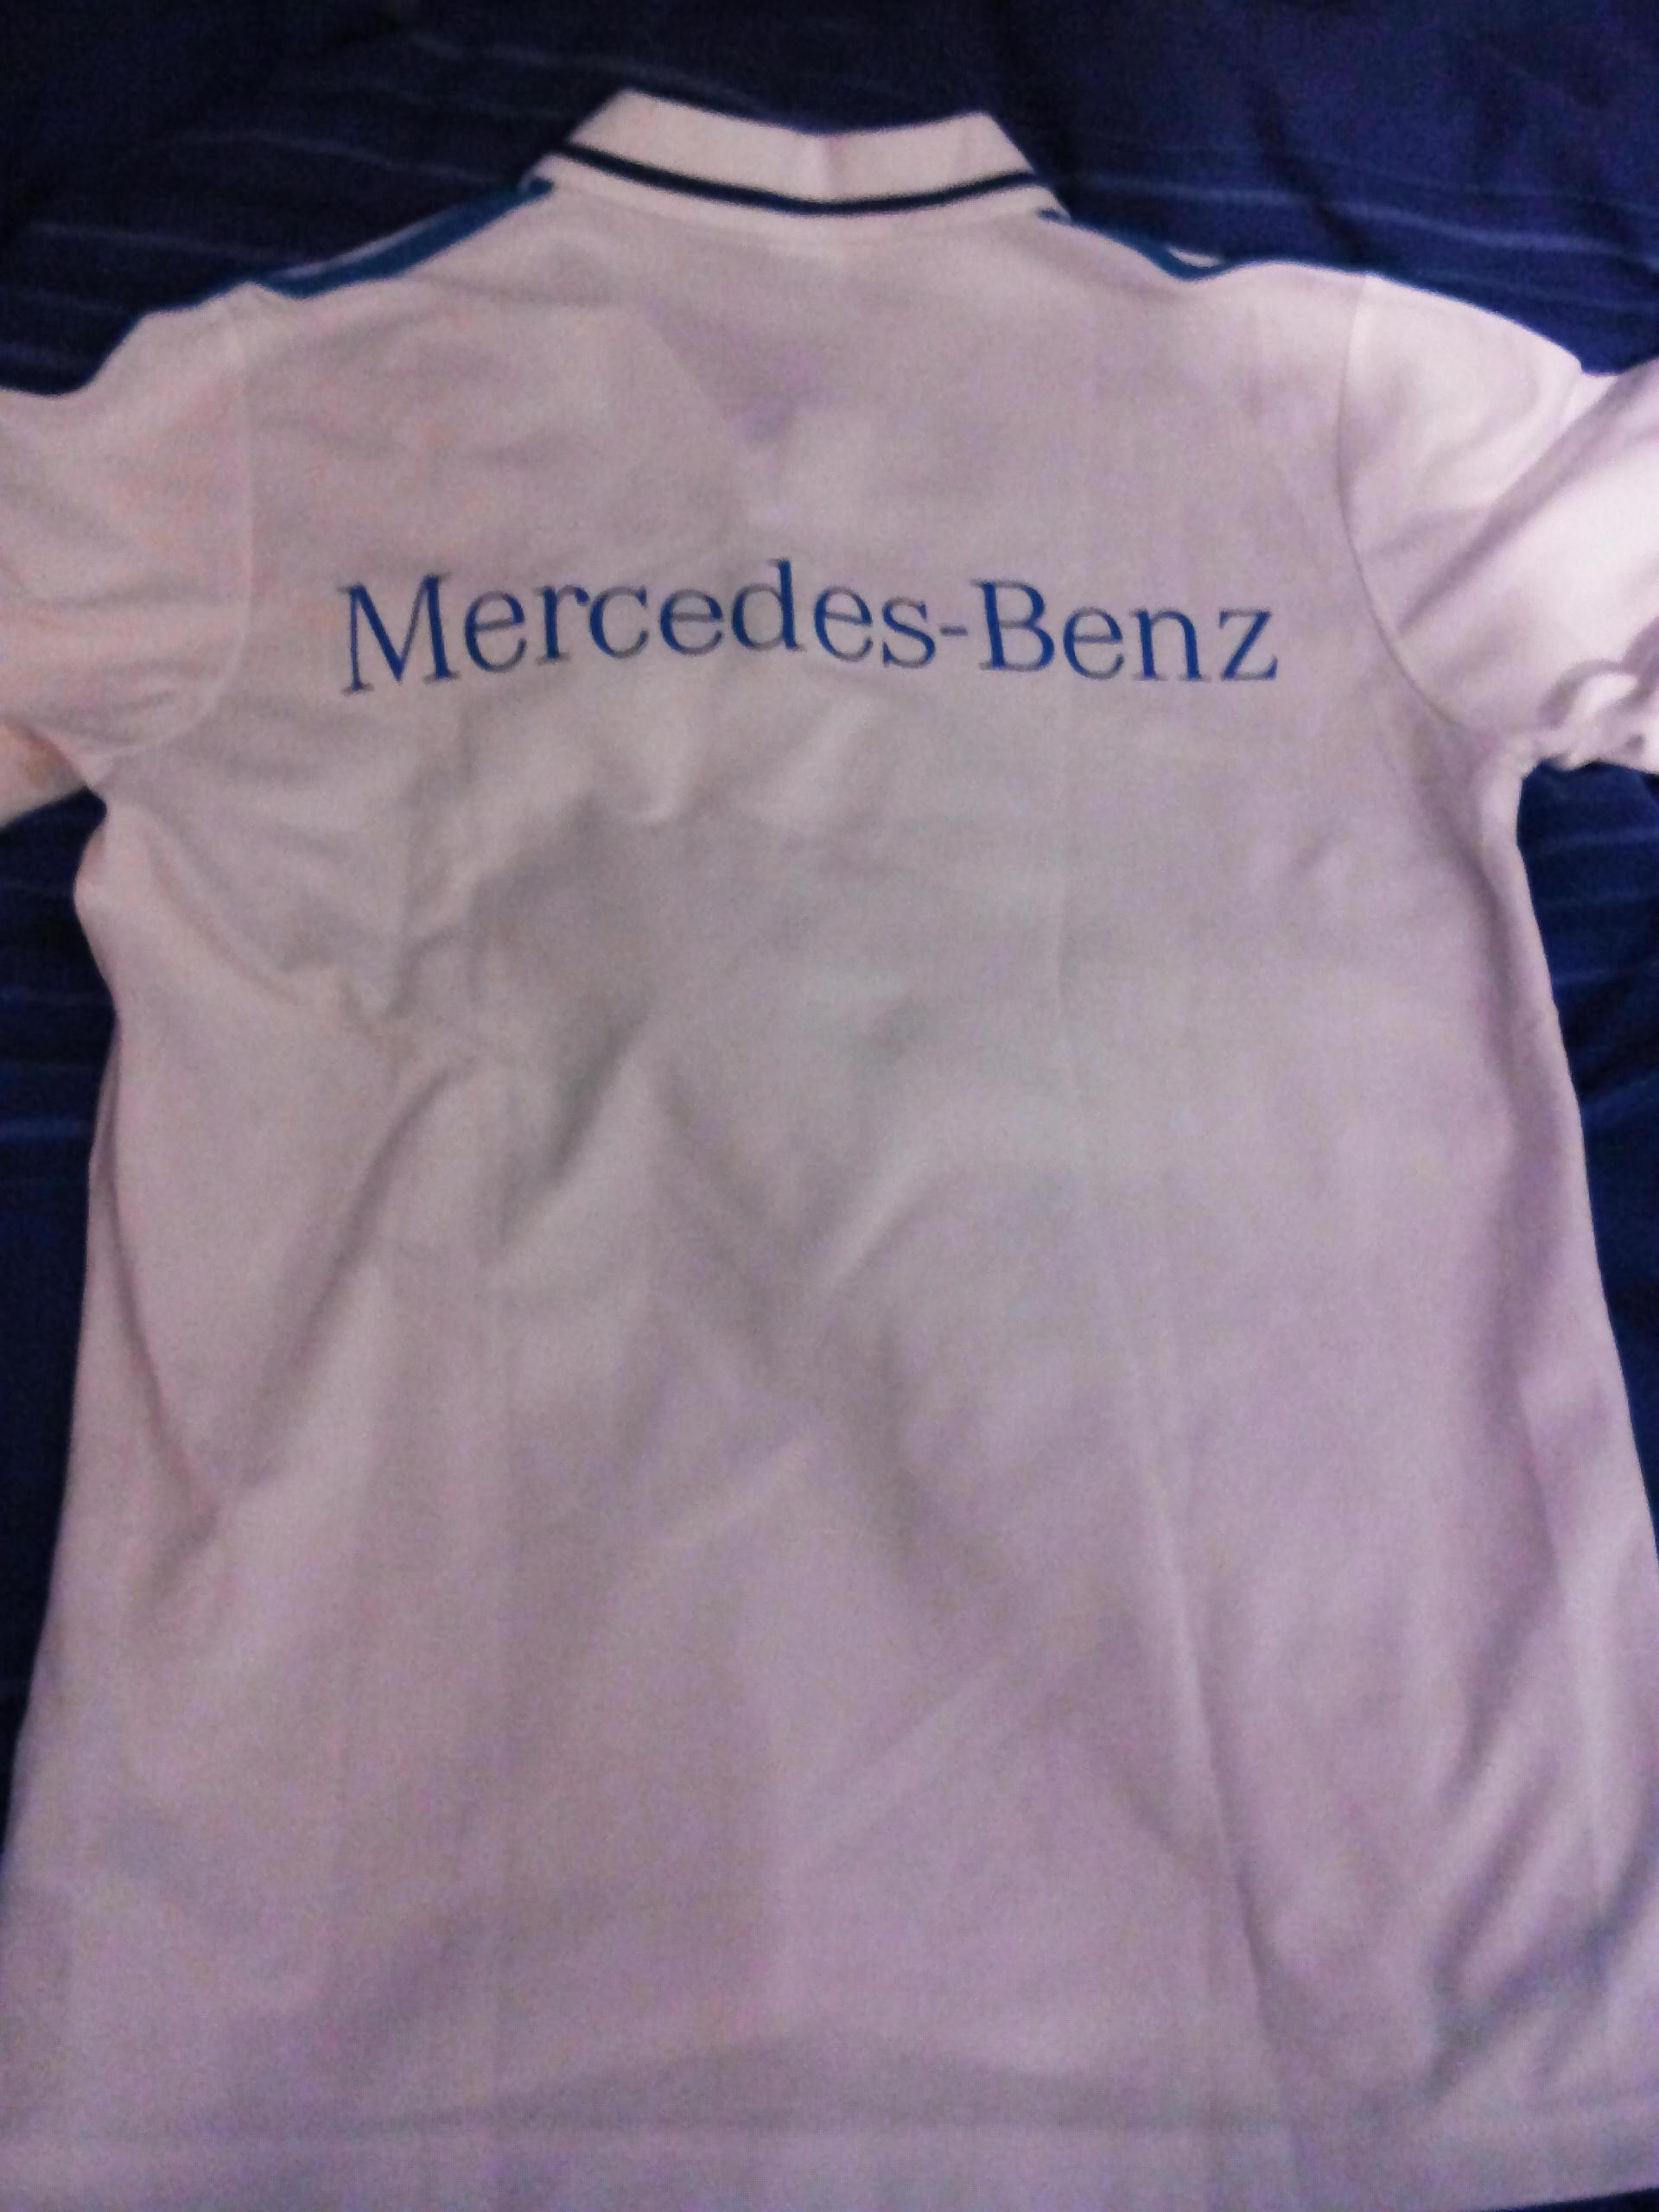 shirt babies mercedes concept petronas p amg white driver kids shirts benz t team design motorsport